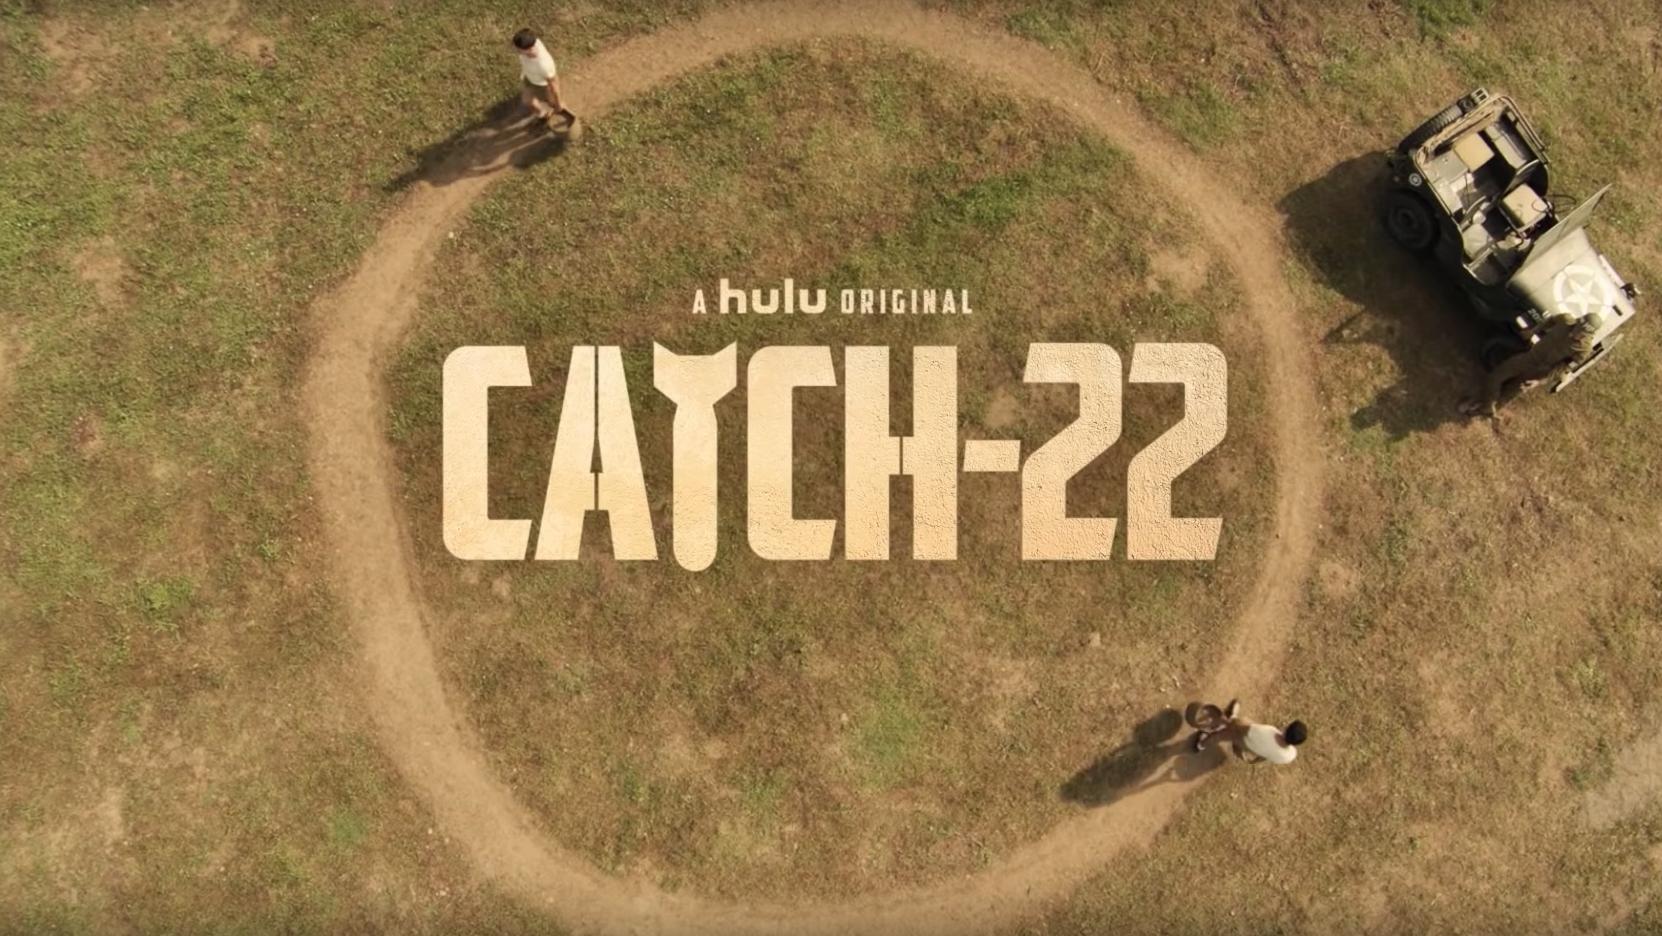 Catch 22 Trailer -